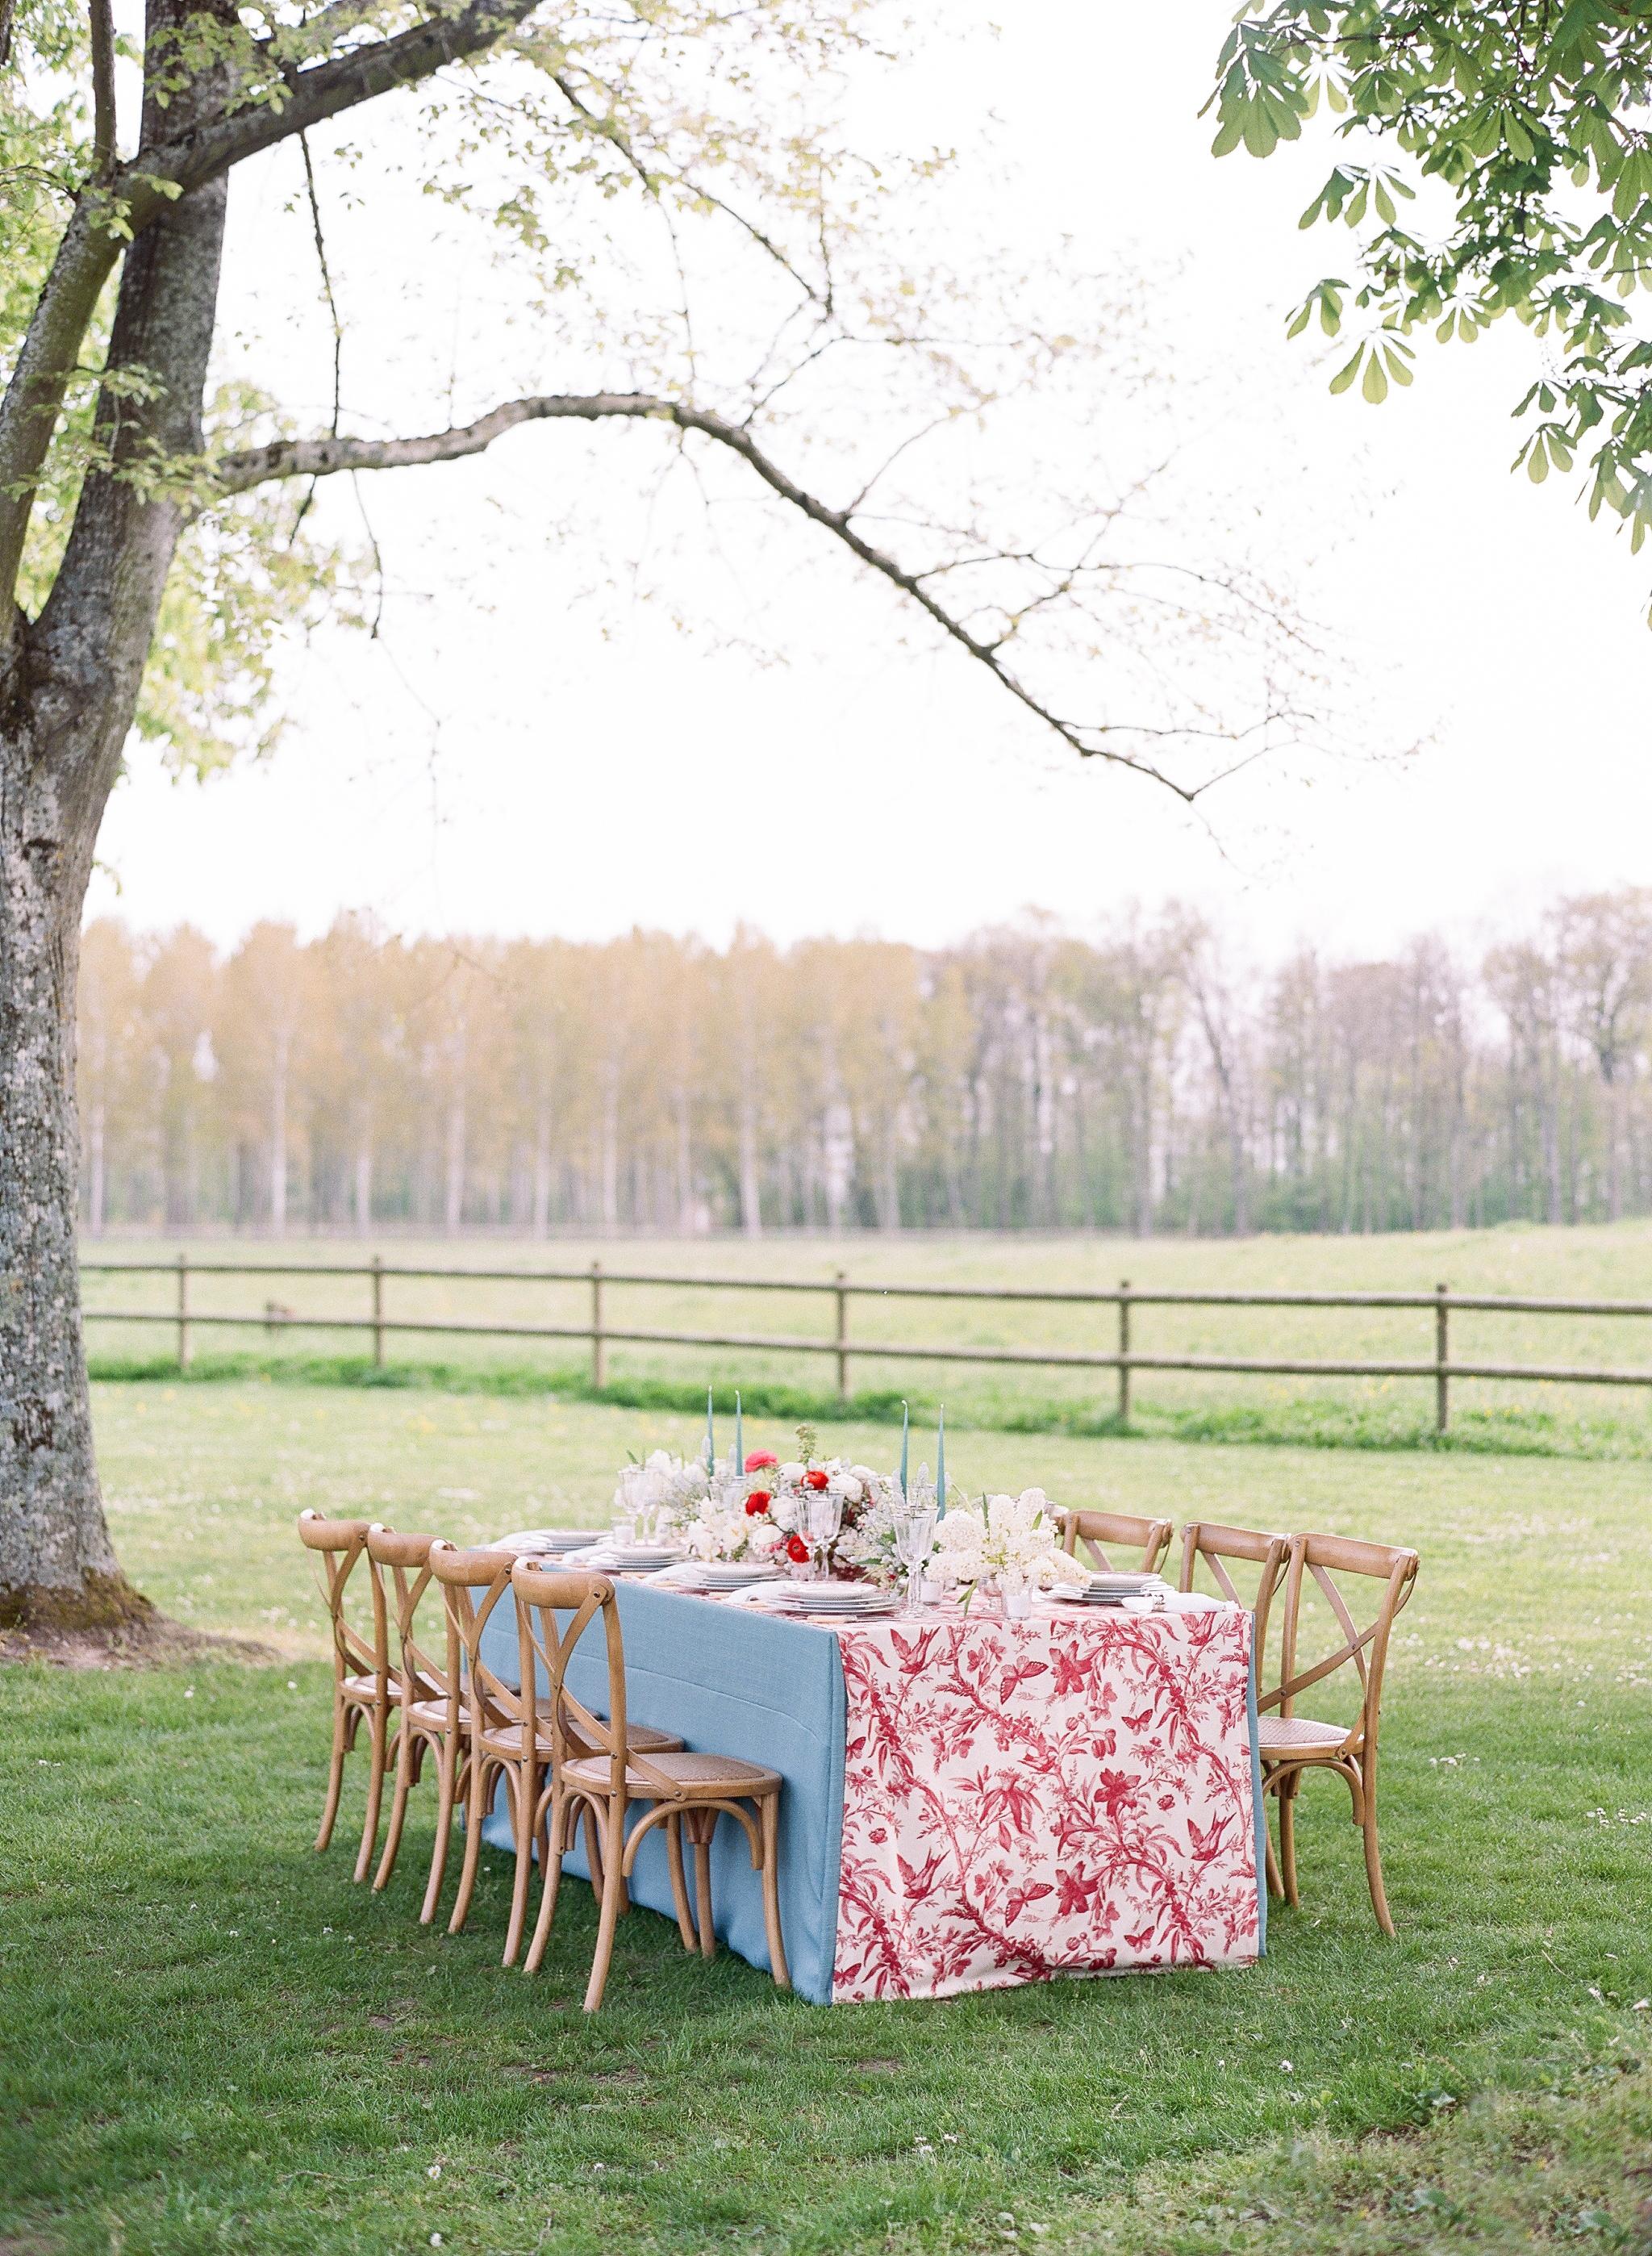 Sylvie-Gil-0008-Workshop-film-photography-chateau-wedding-france-reception-outdoor.jpg